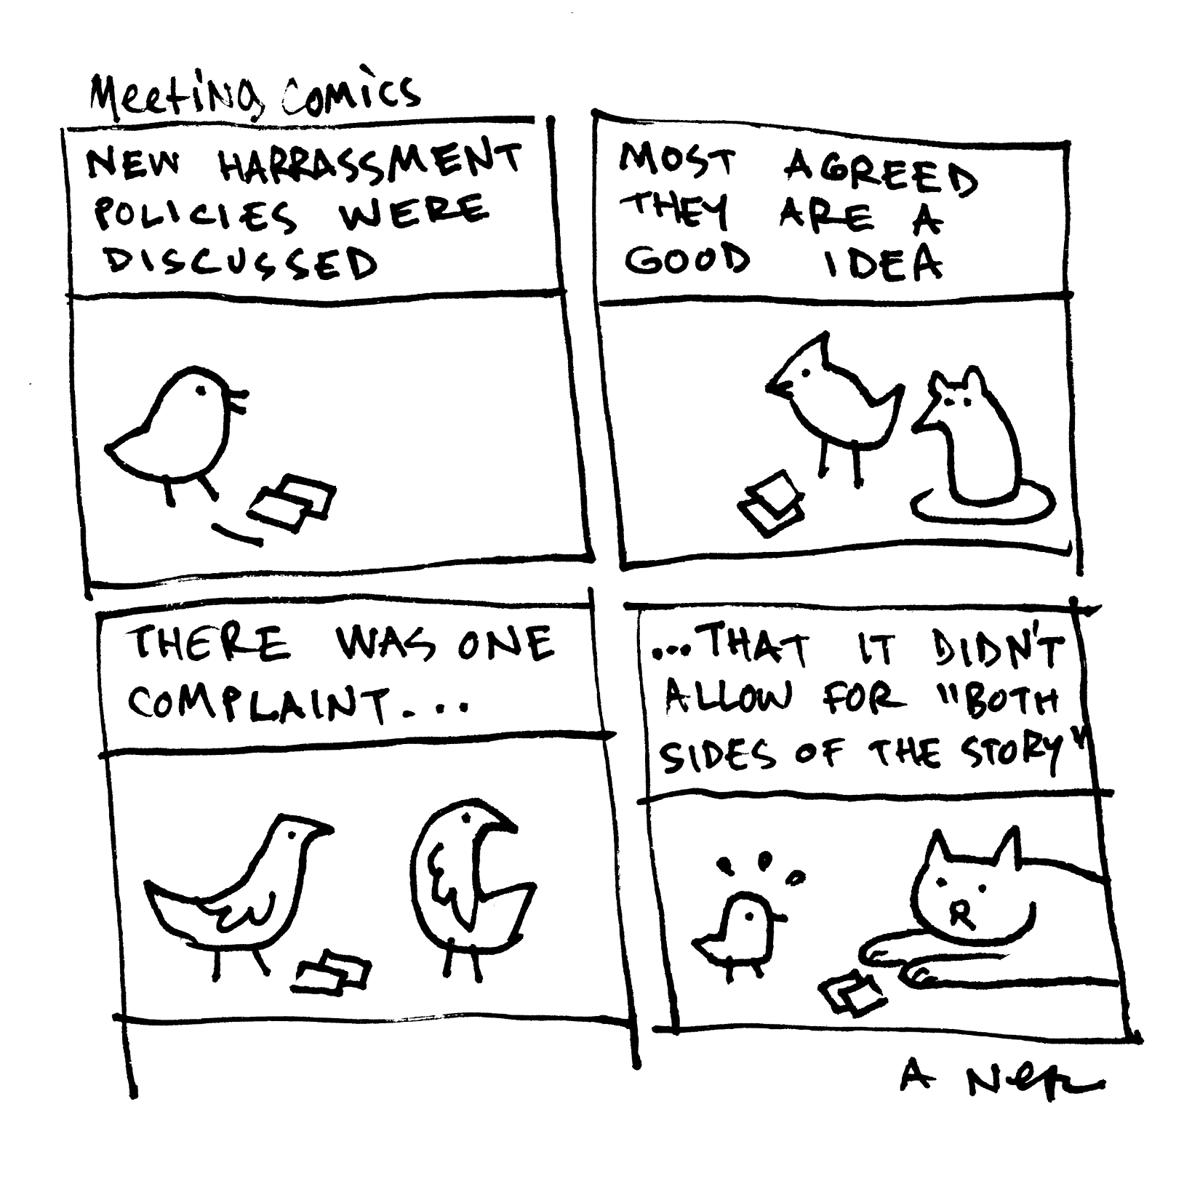 Image of Meeting Comics #1